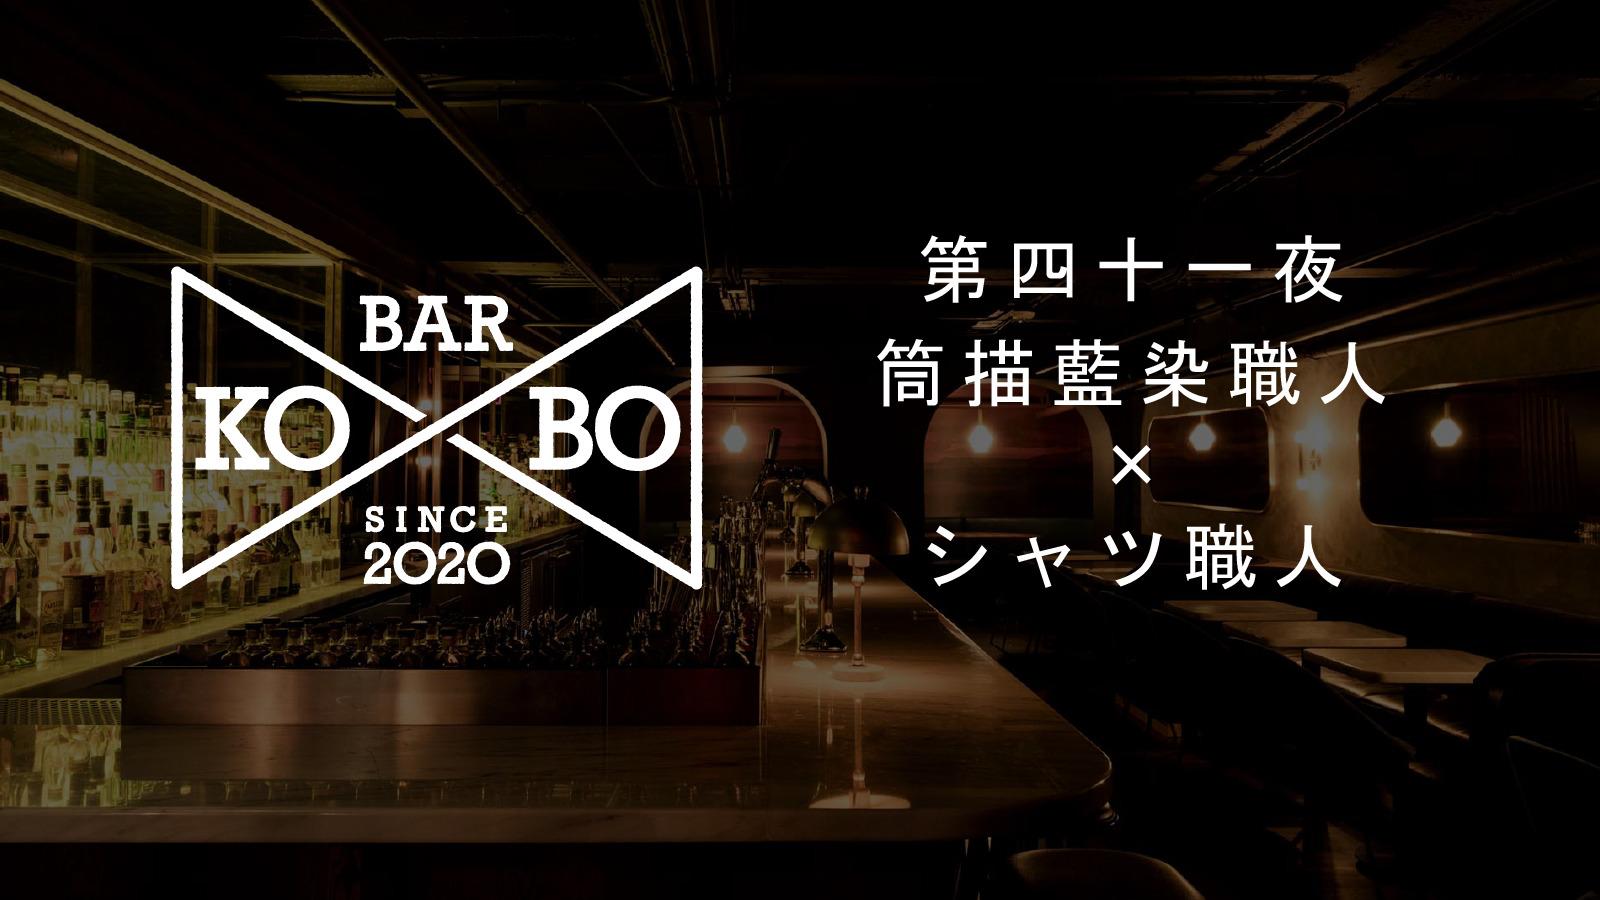 【Bar KO-BO 第四十一夜】筒描藍染職人×シャツ職人